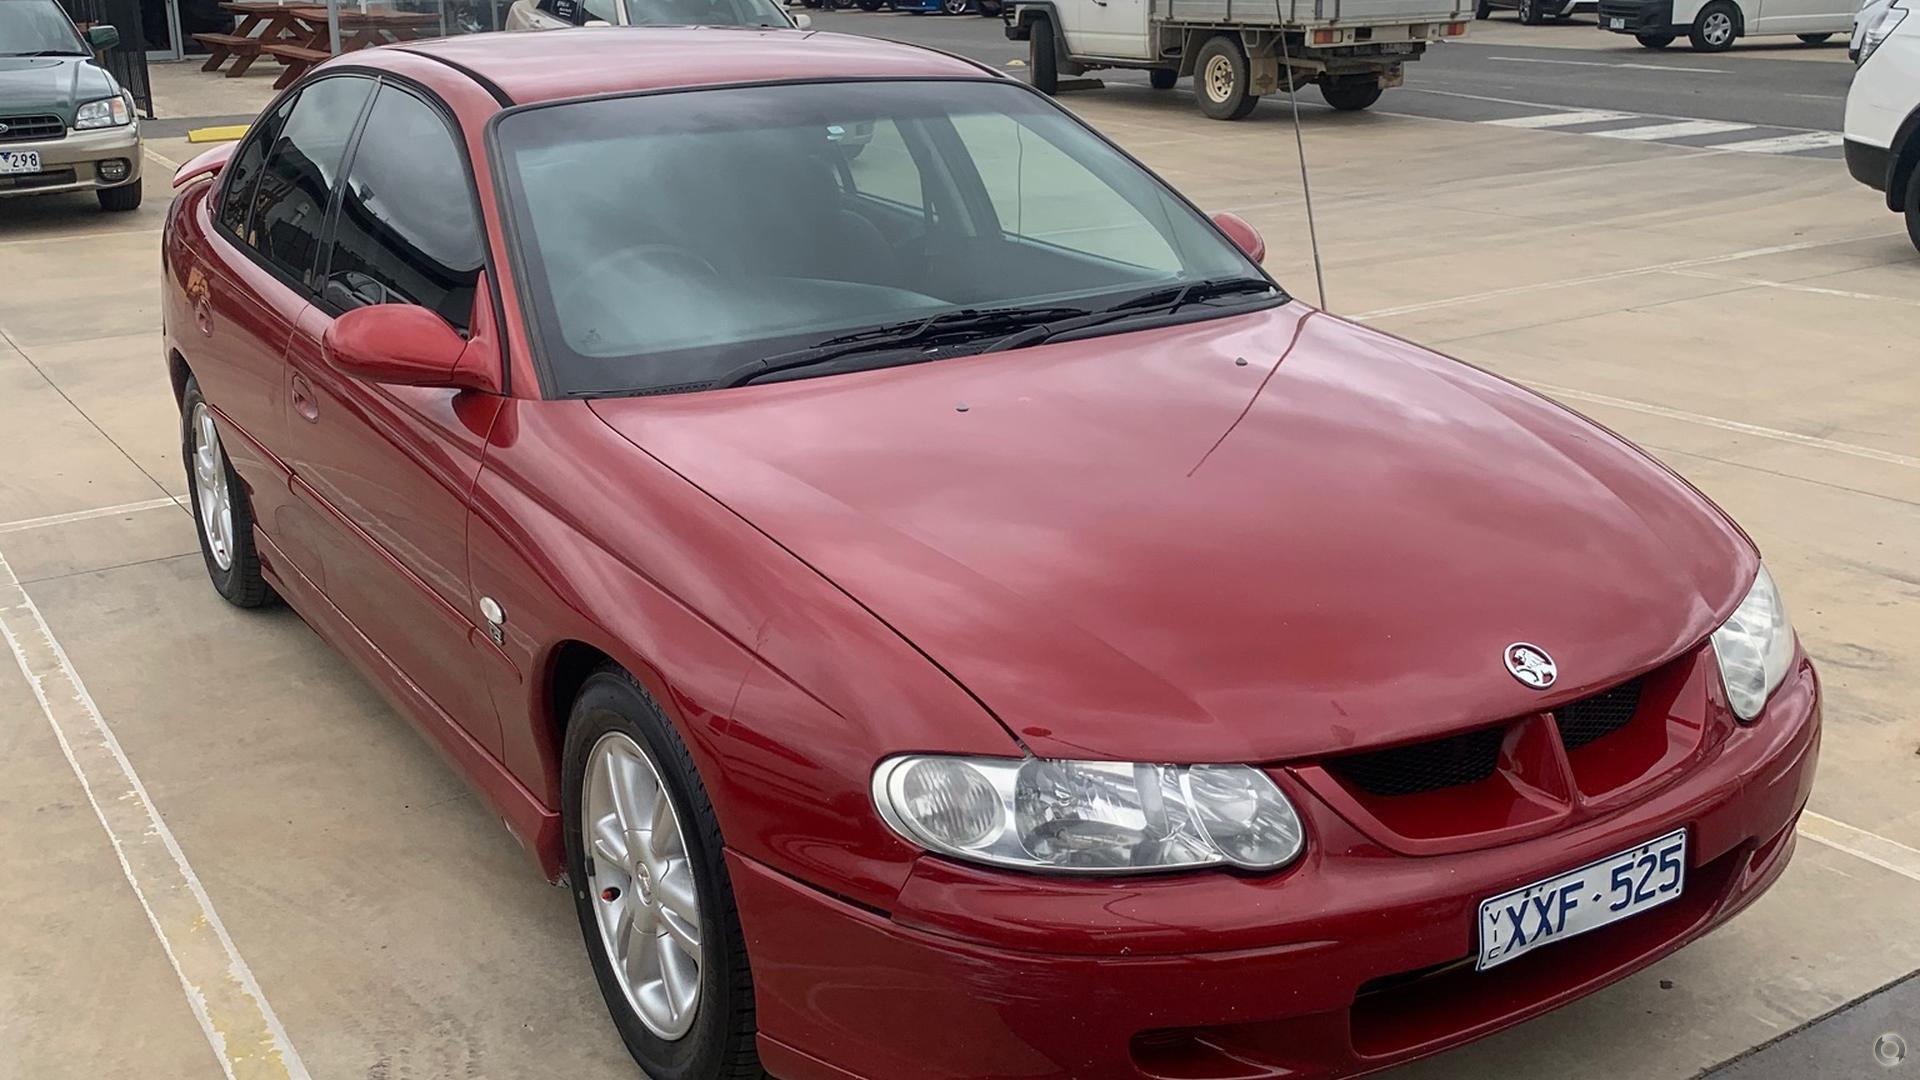 2002 Holden Commodore Equipe VX II